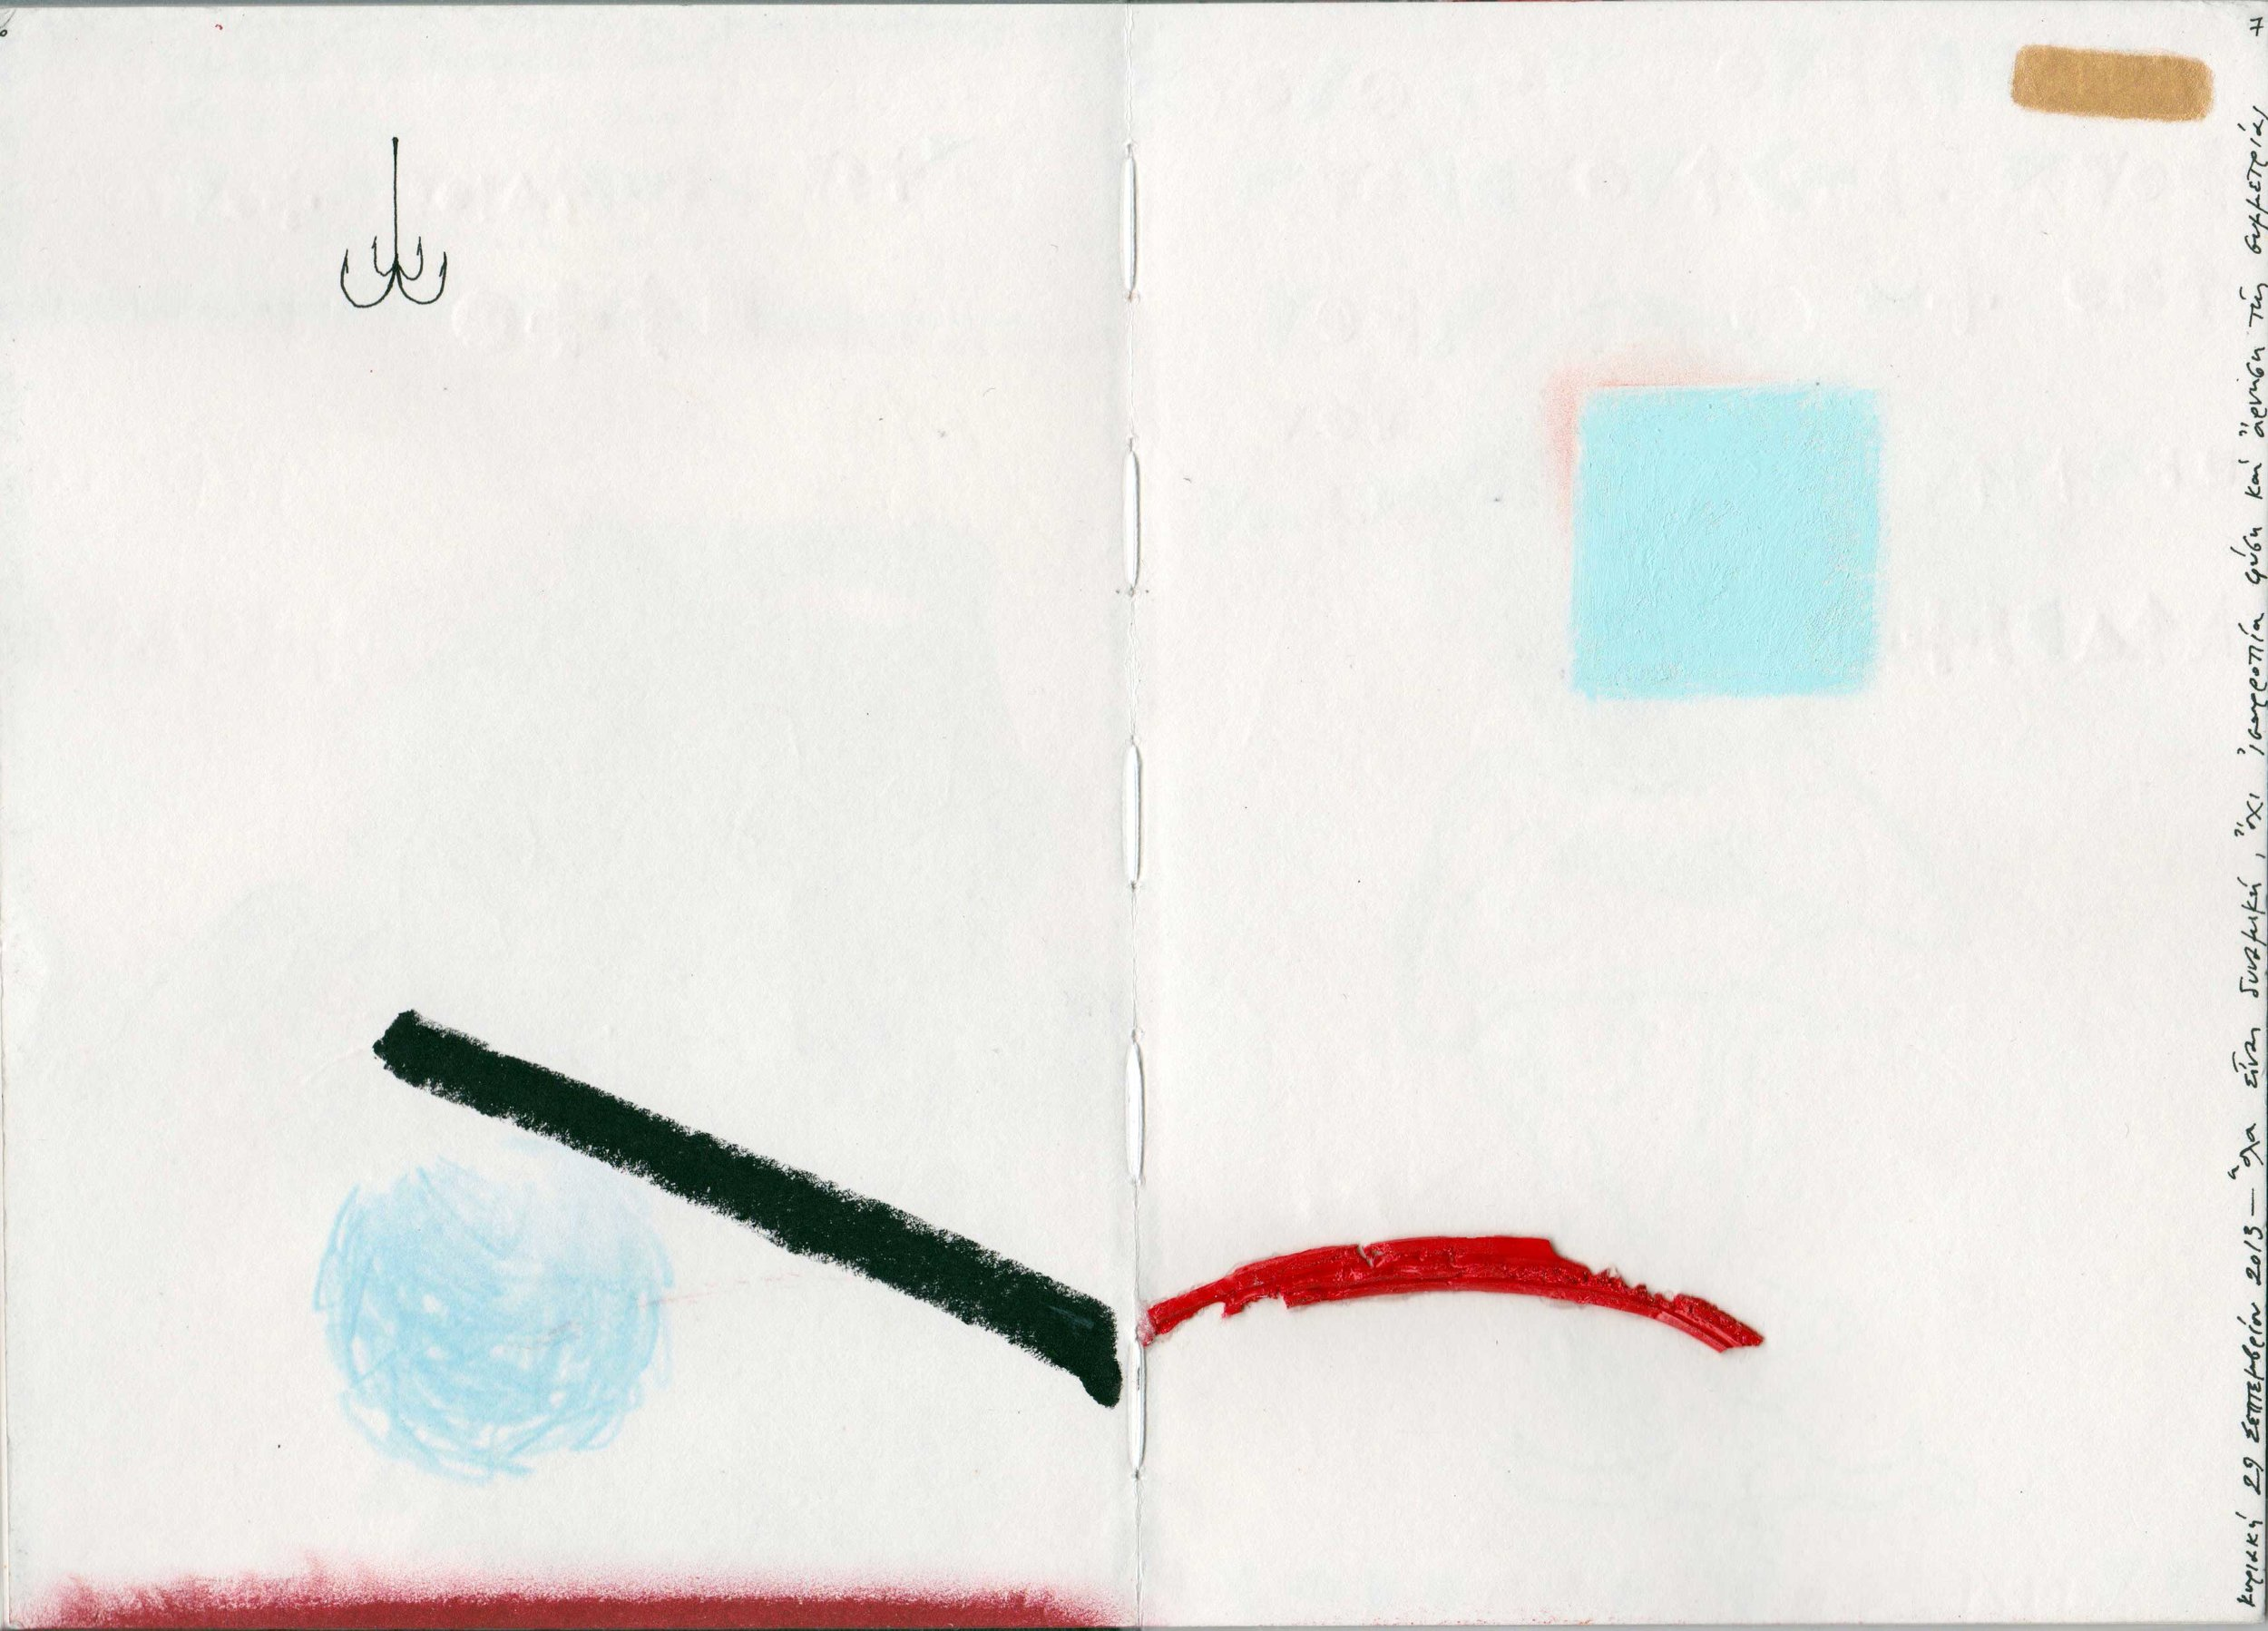 diary 15 page 6-7